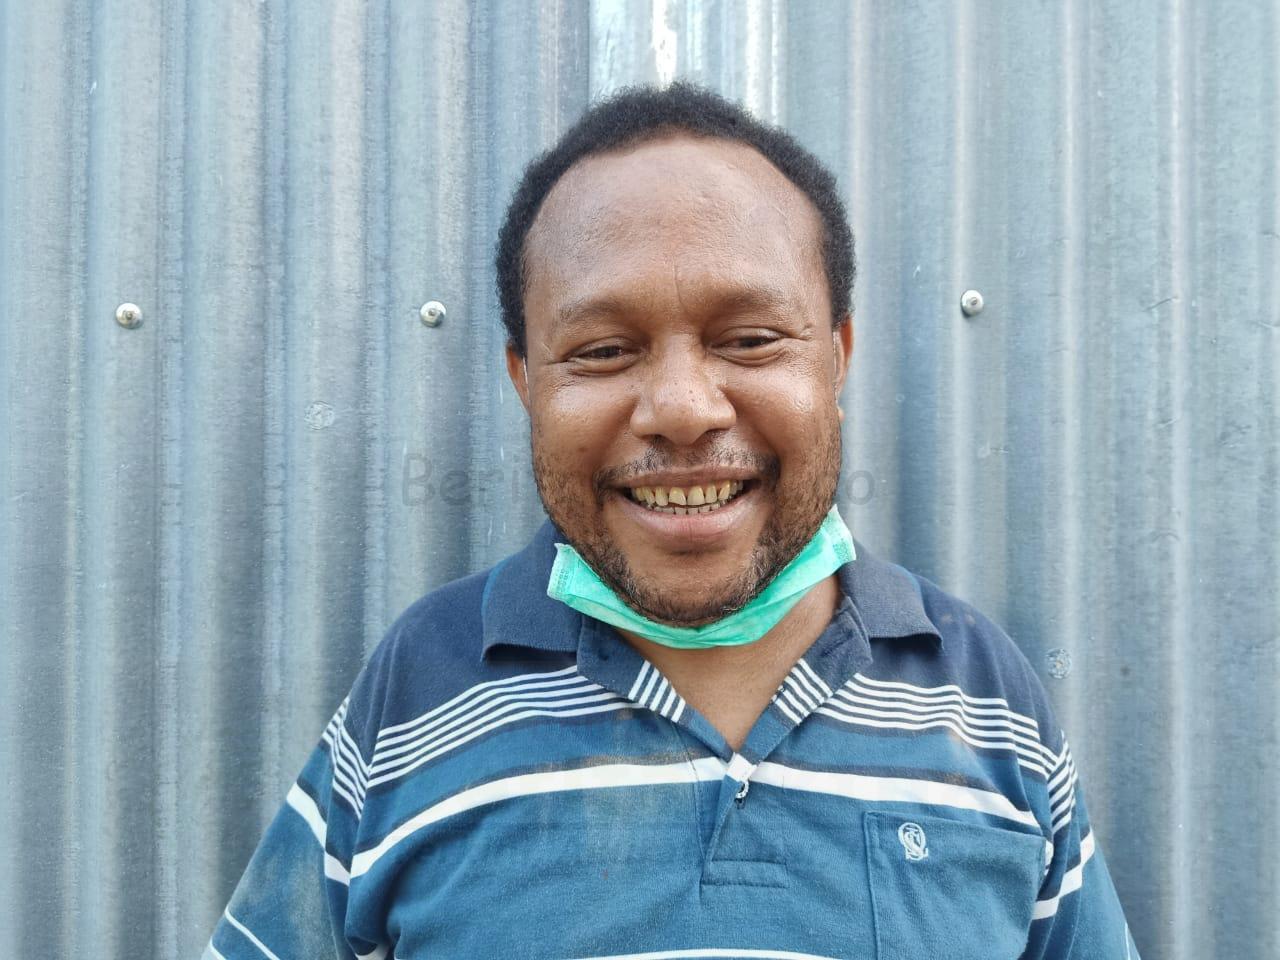 Franky Awom: HEBO Kuat, Menang 80 Persen di Pilkada Manokwari 16 IMG 20201205 WA0026